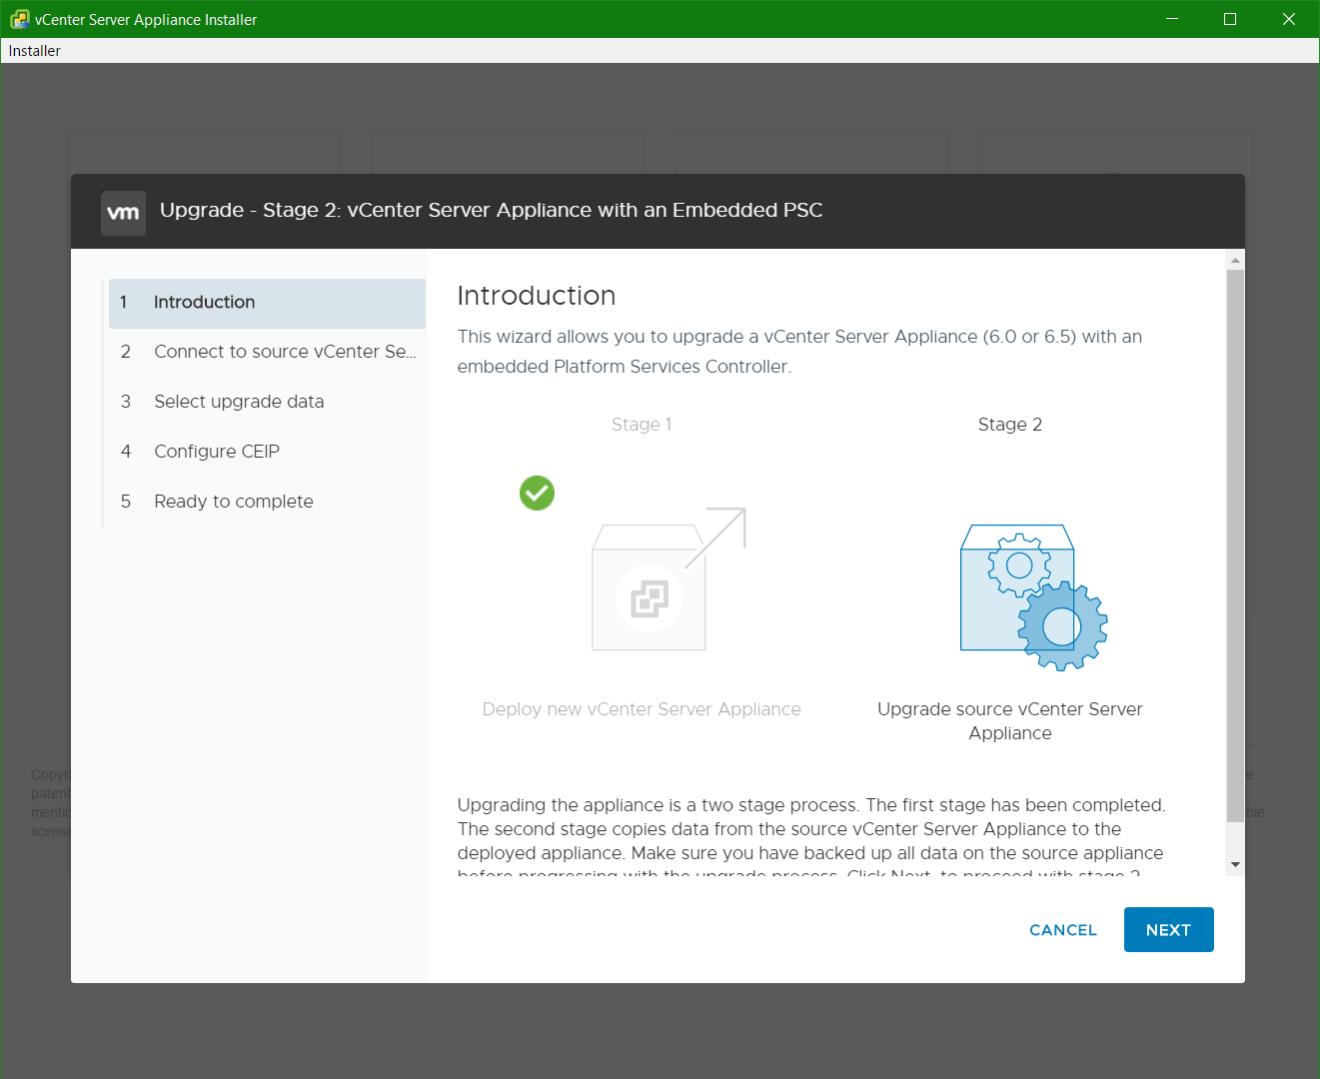 domalab.com vmware vcsa upgrade stage 2 install wizard